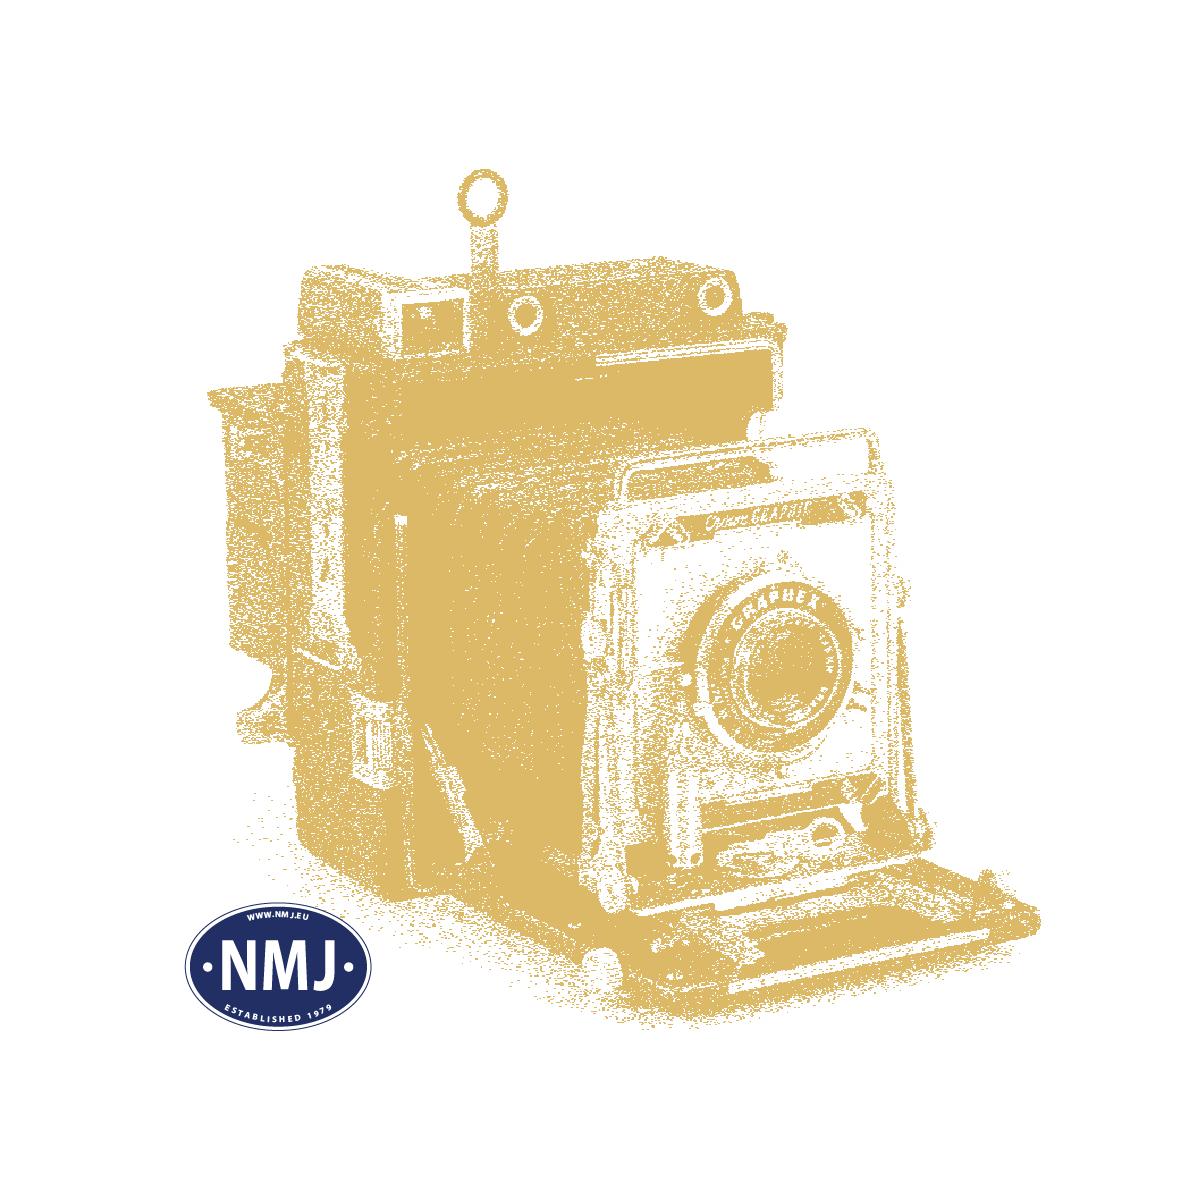 NMJ0.21506 - NMJ Superline Modell des Personen/Gepäckwagens BF10.21506 der NSB, Spur 0